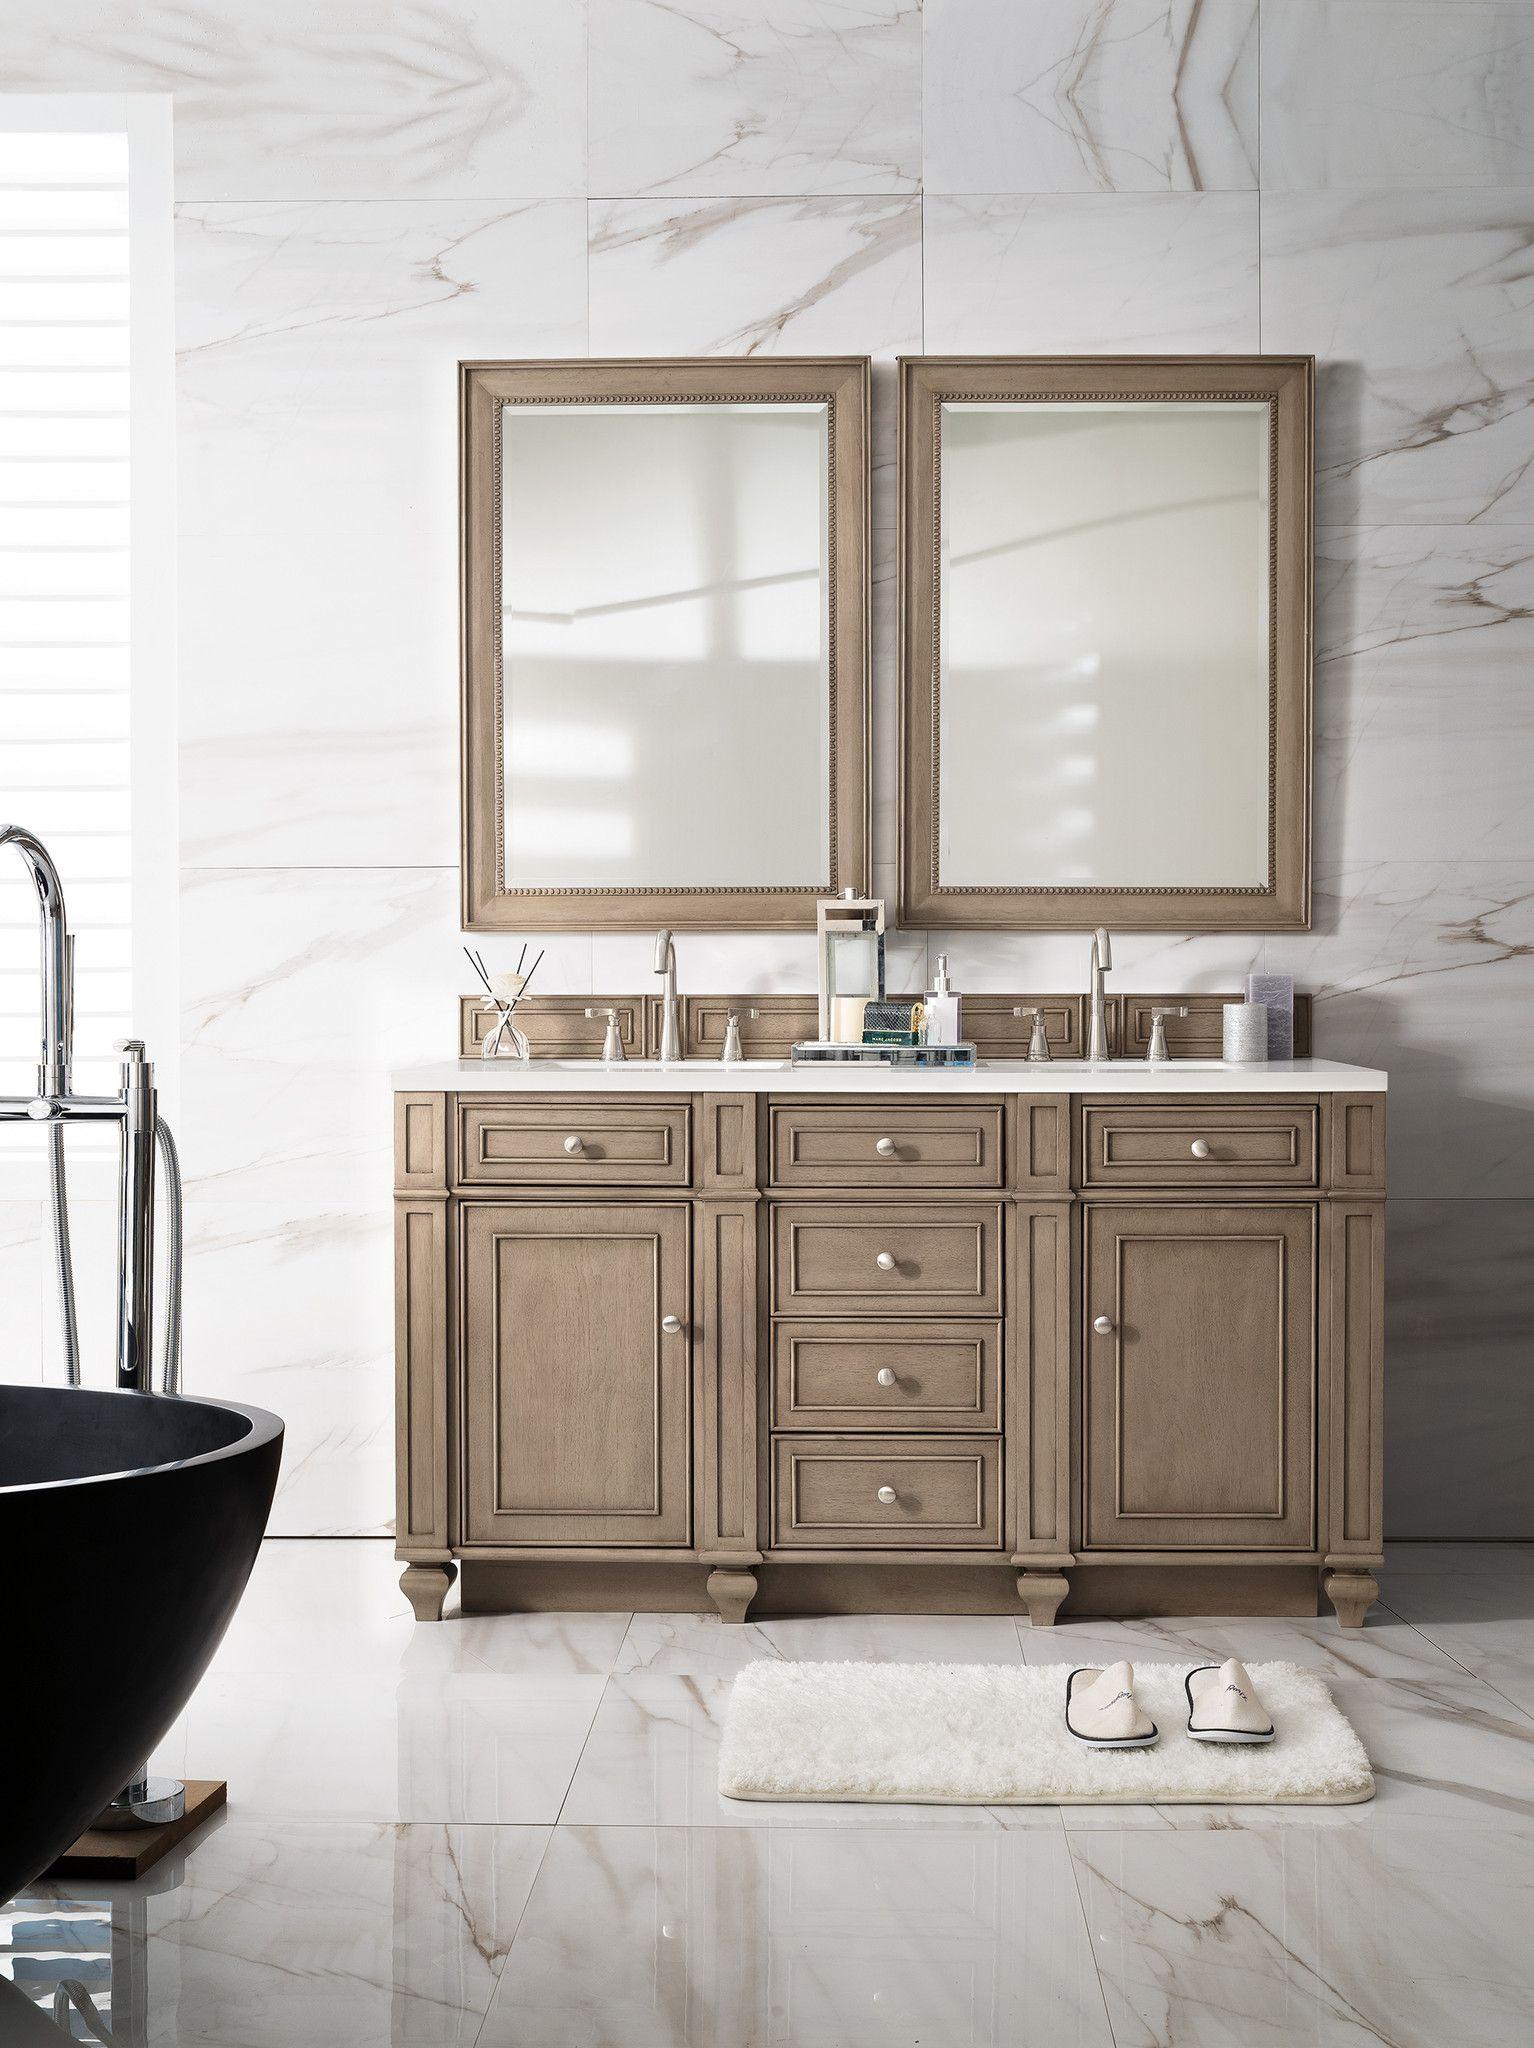 bathroom rustic unusual vanities over inch mirrors double sink vanity mirror ideas